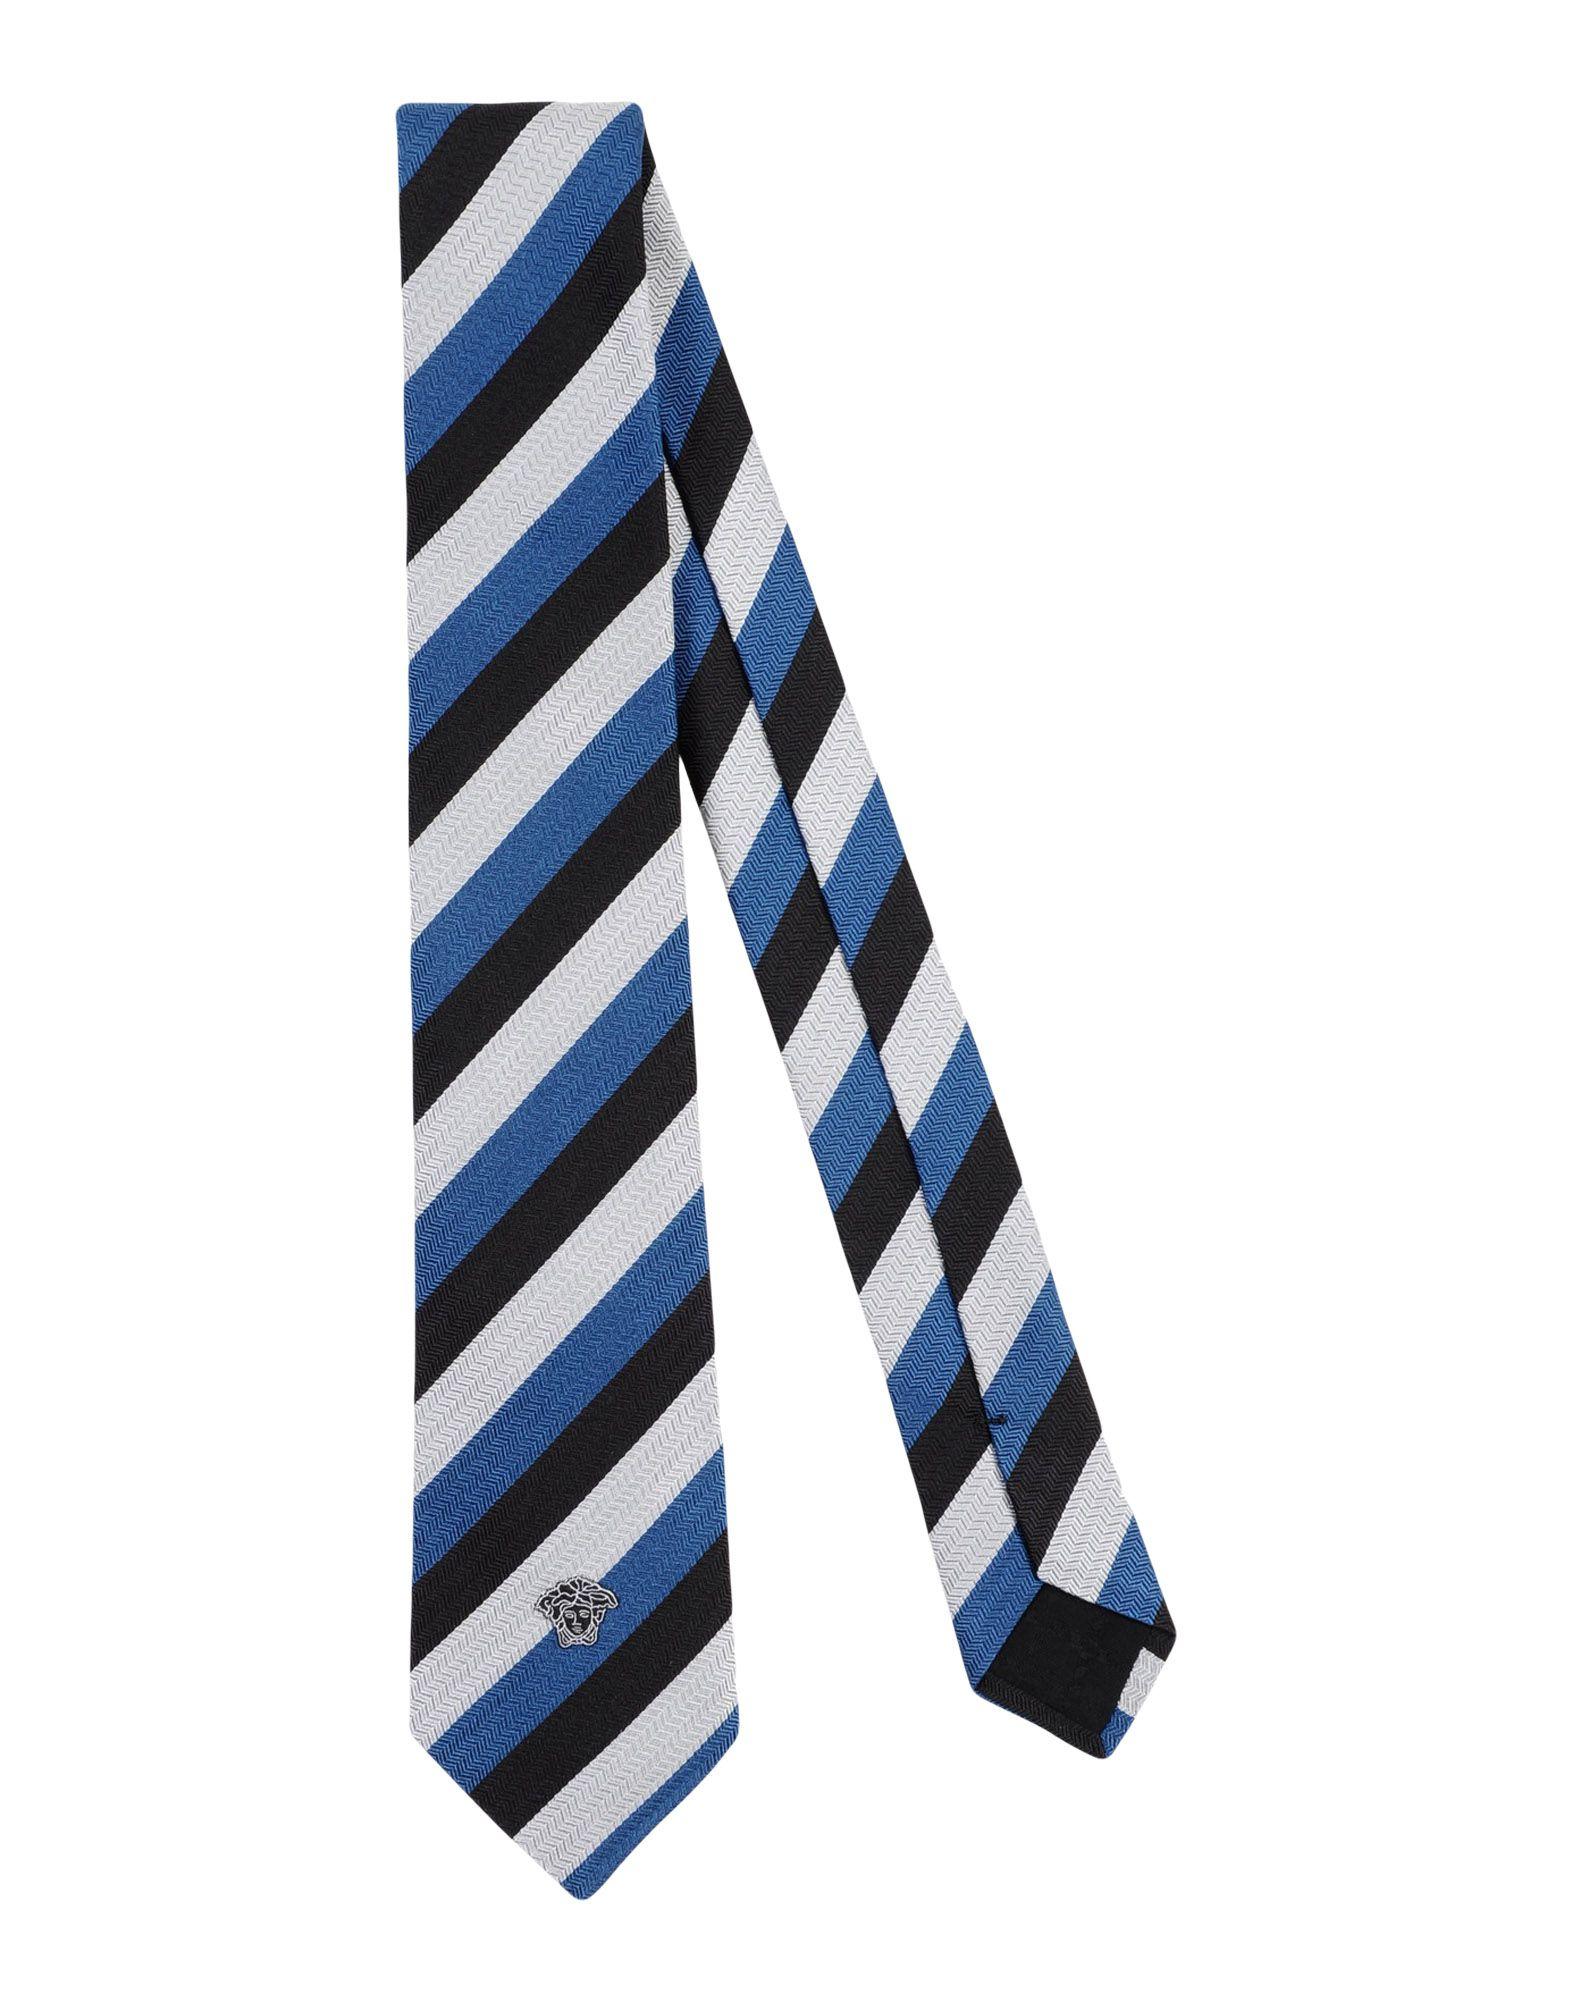 VERSACE Галстук versace бордовый галстук в клетку внизу с логотипом versace 821752 page 4